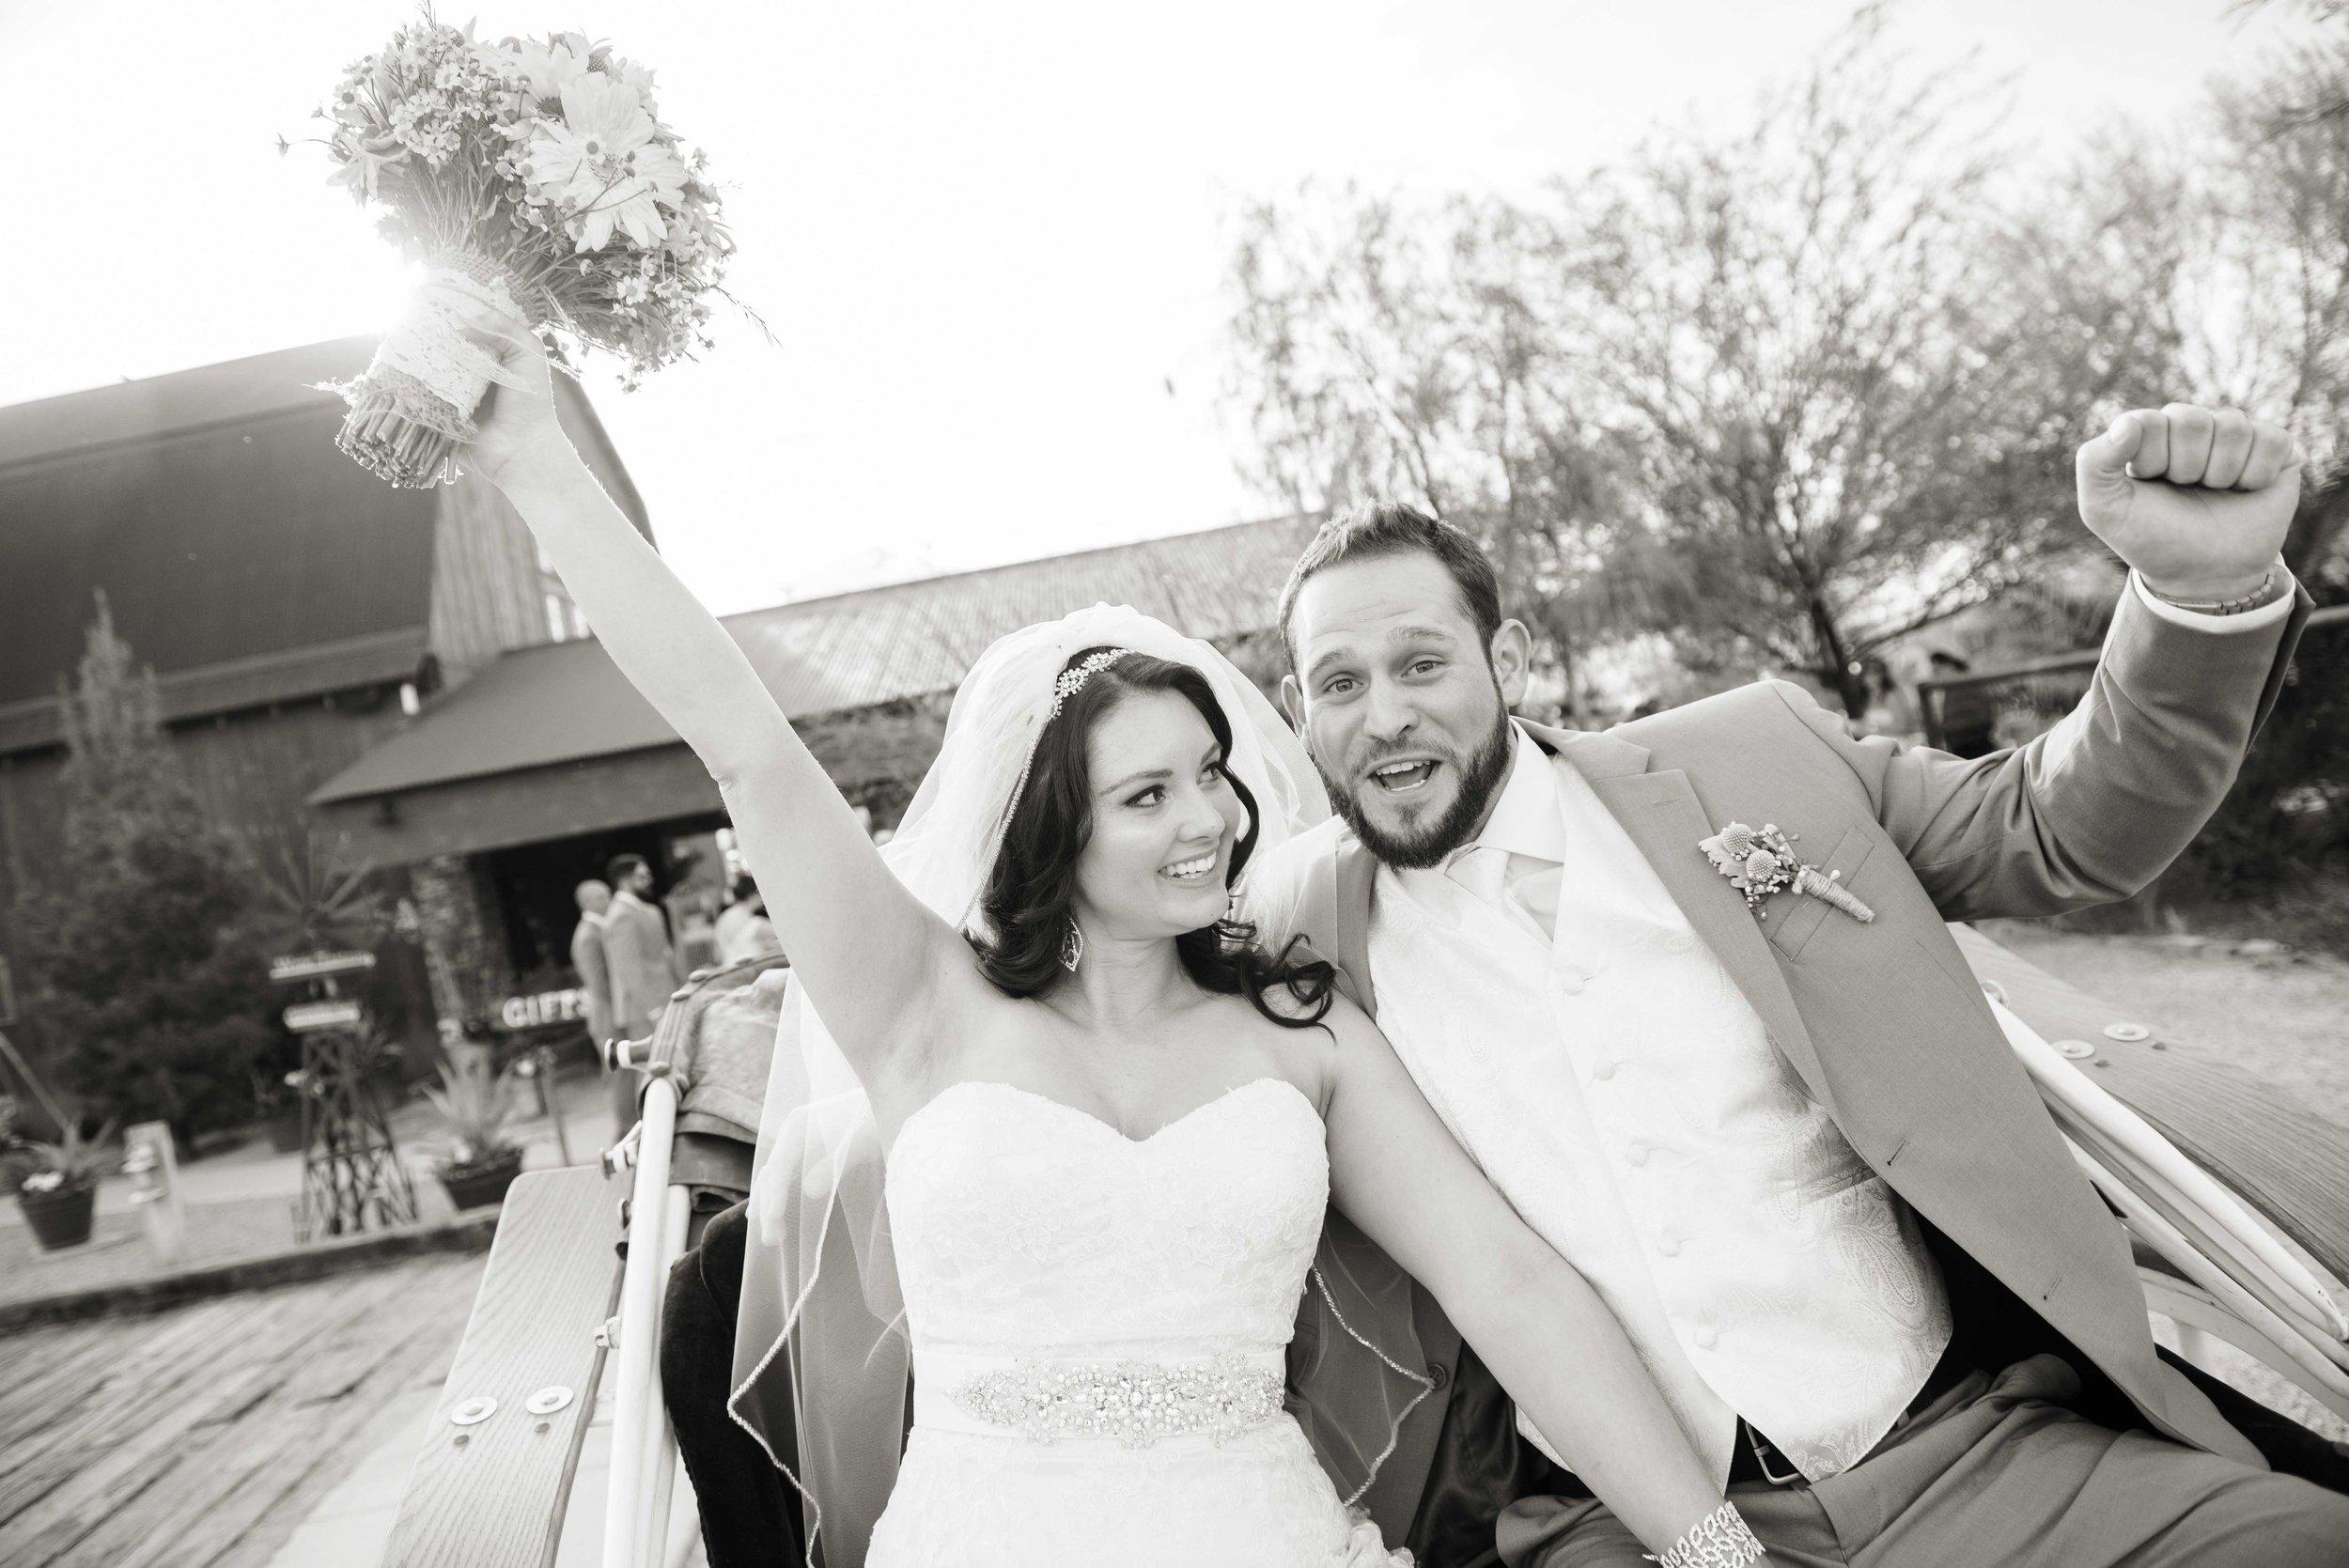 weddingwebsitesmallerpics-118.jpg